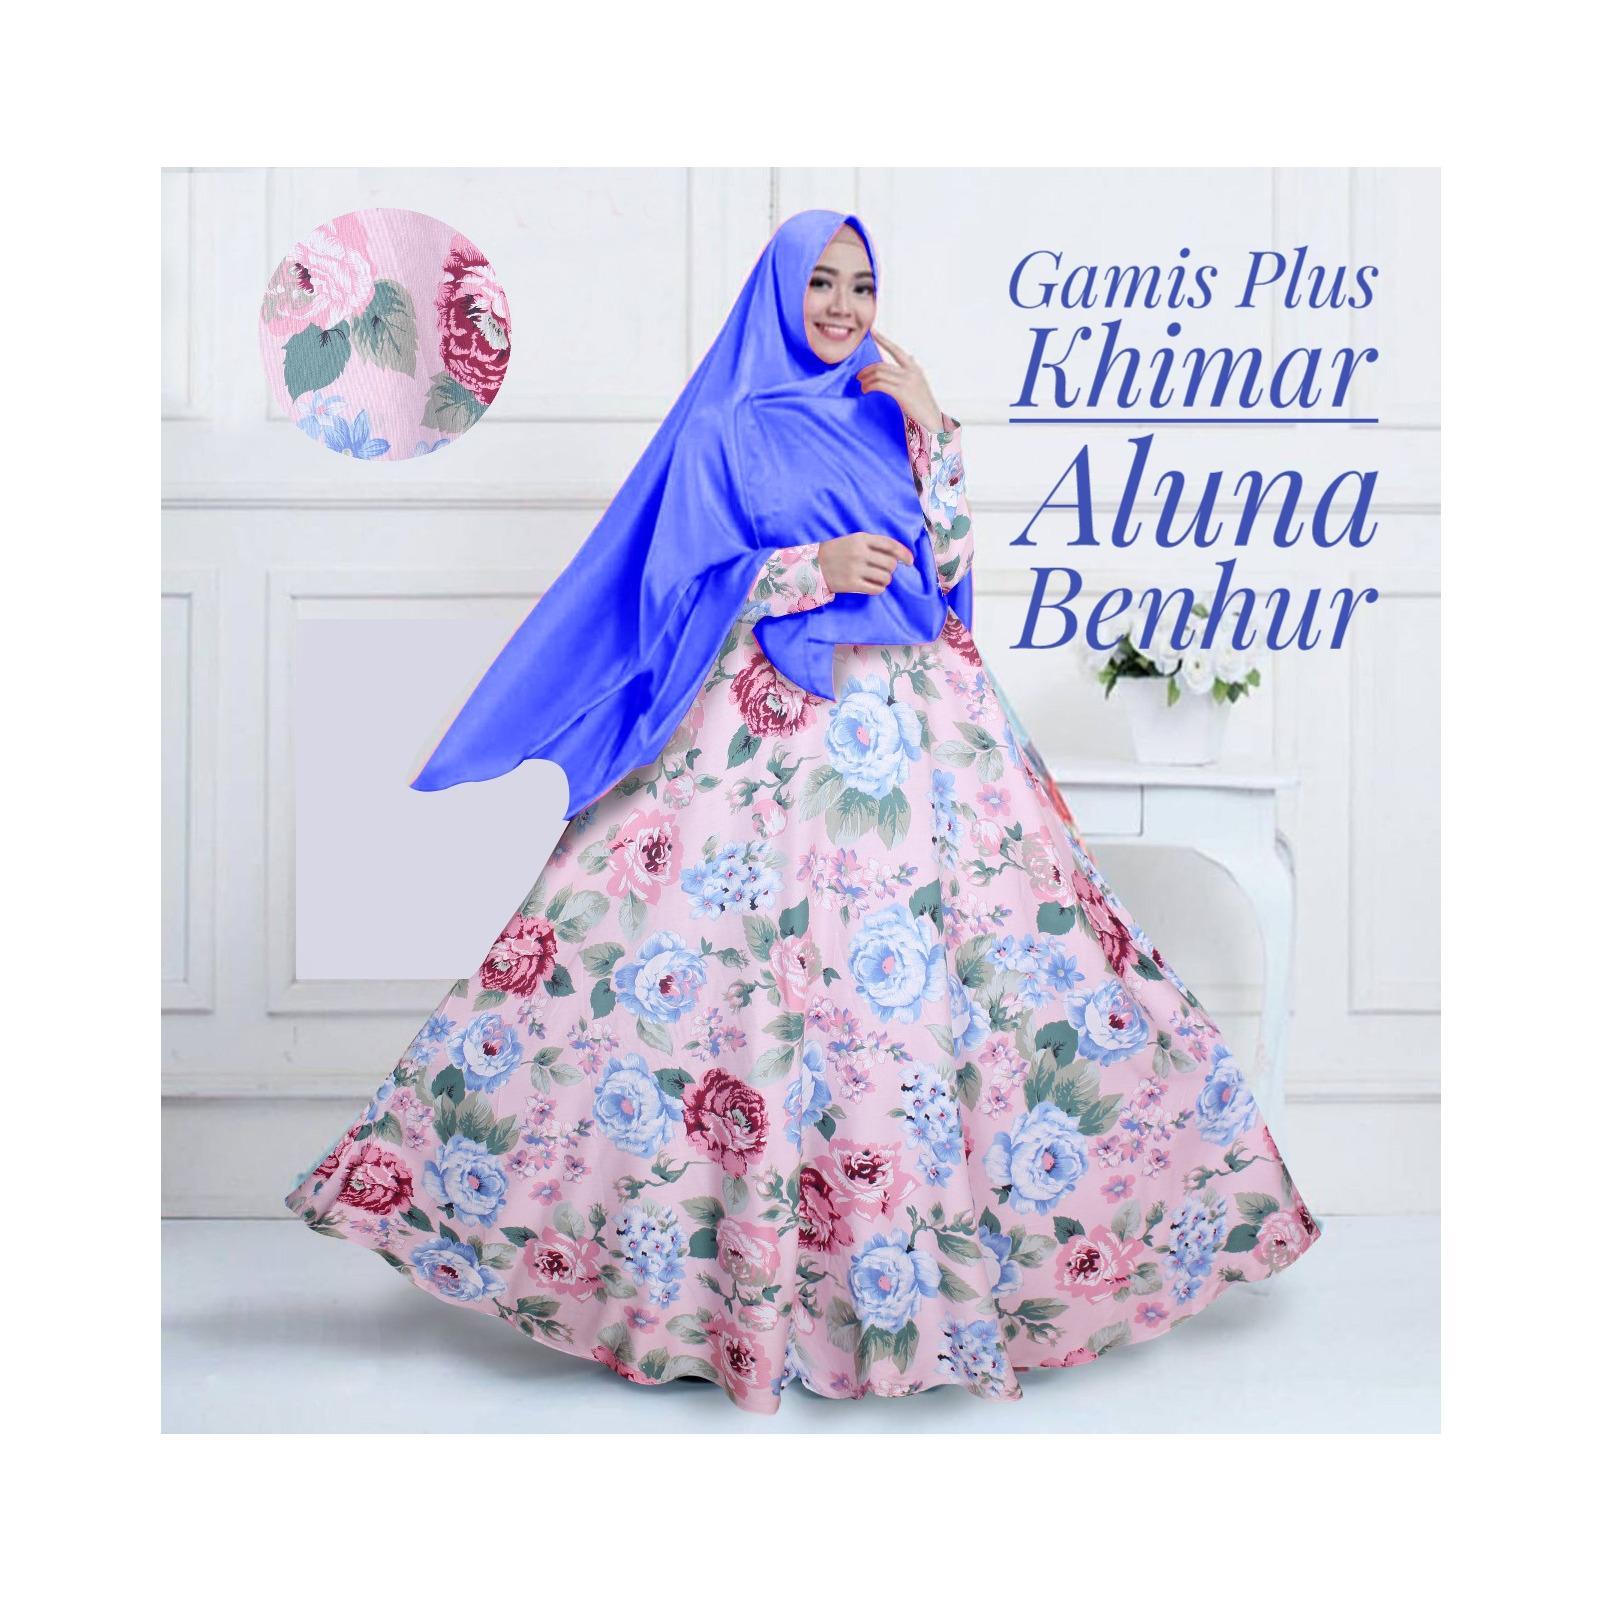 Gamis Katun Syari Murah / Gamis Maxi Dress Katun Aluna Plus Khimar Biru / Gamis Katun Busui